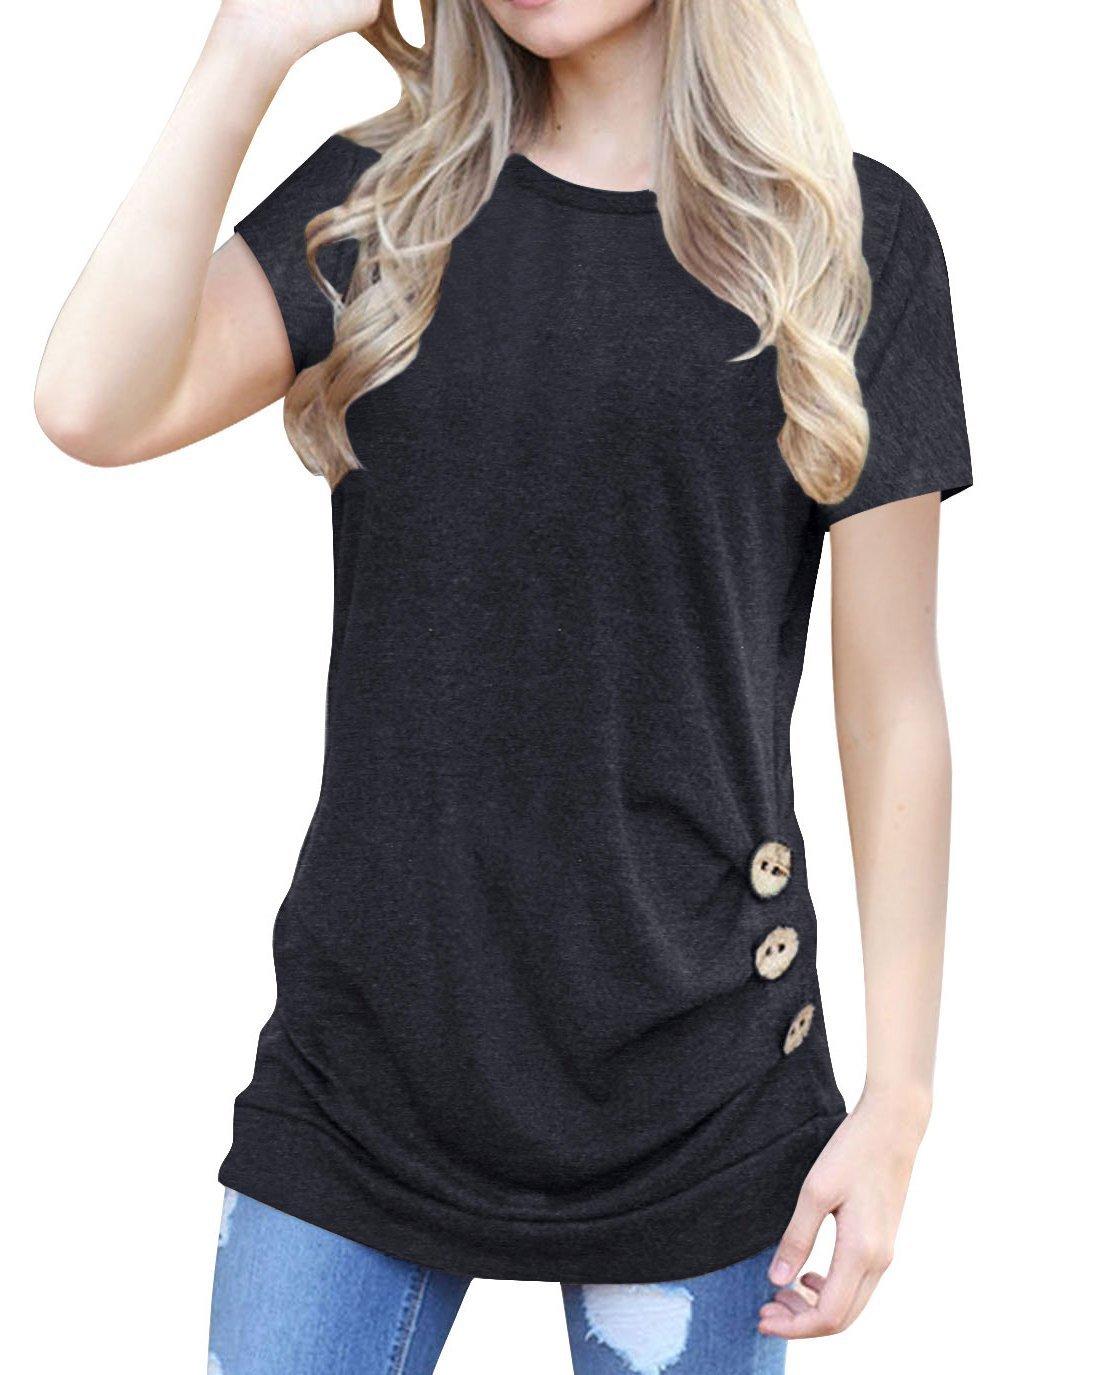 Women's Casual Short Sleeve Tunic Top Sweatshirt Blouse Button Decor T-Shirt Black XL